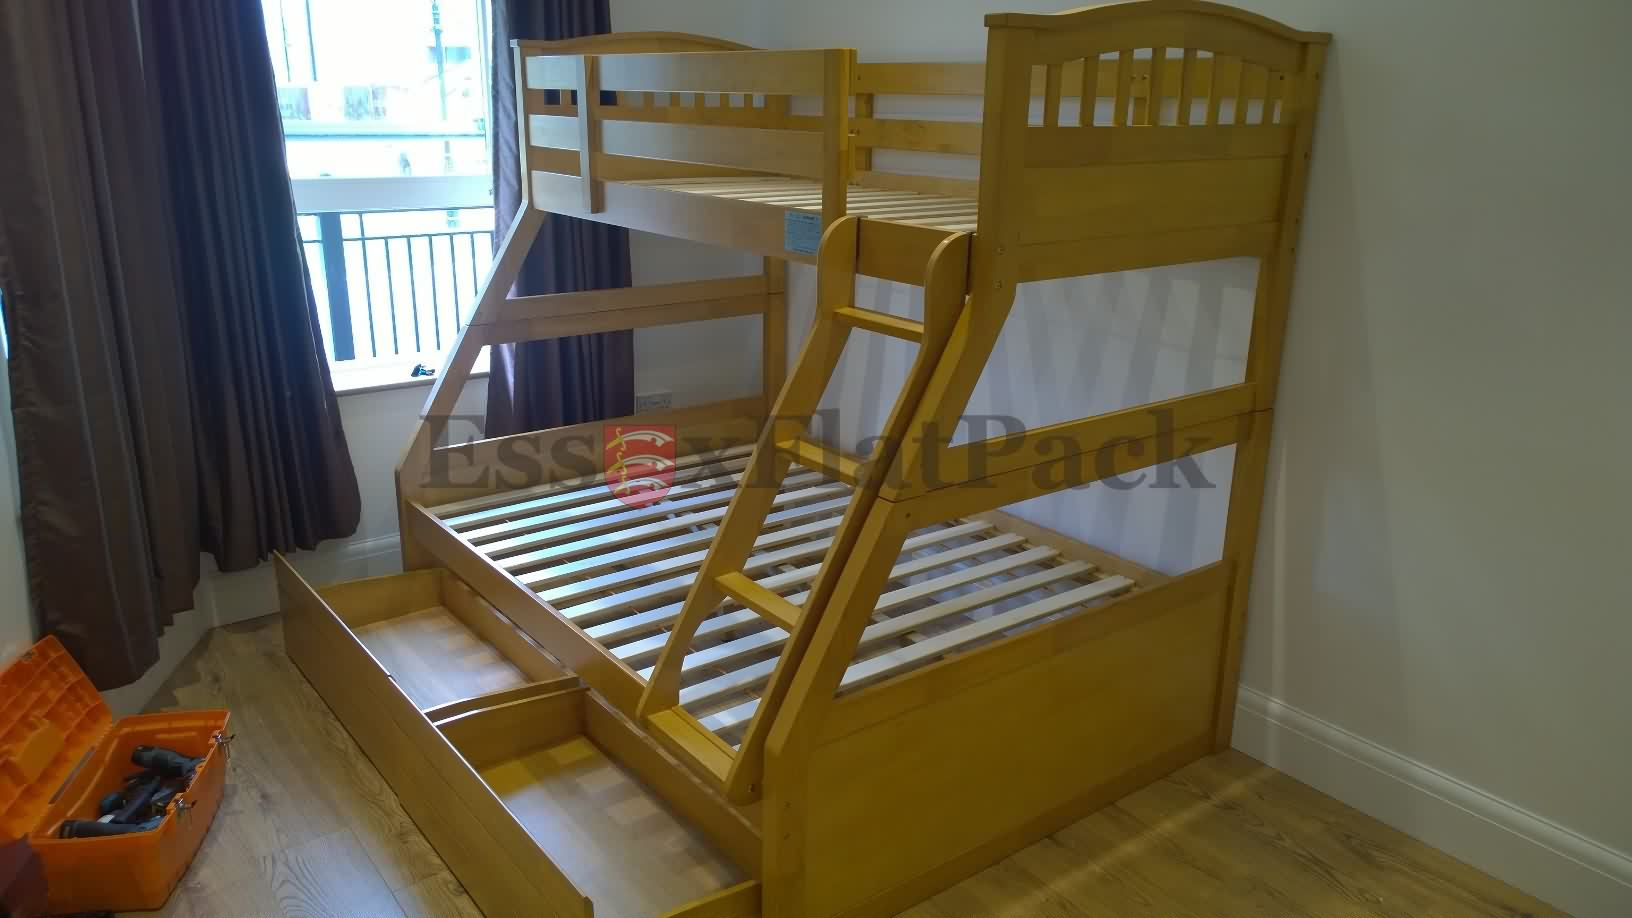 essexflatpack-cabin-bunks-20150708104126.jpg